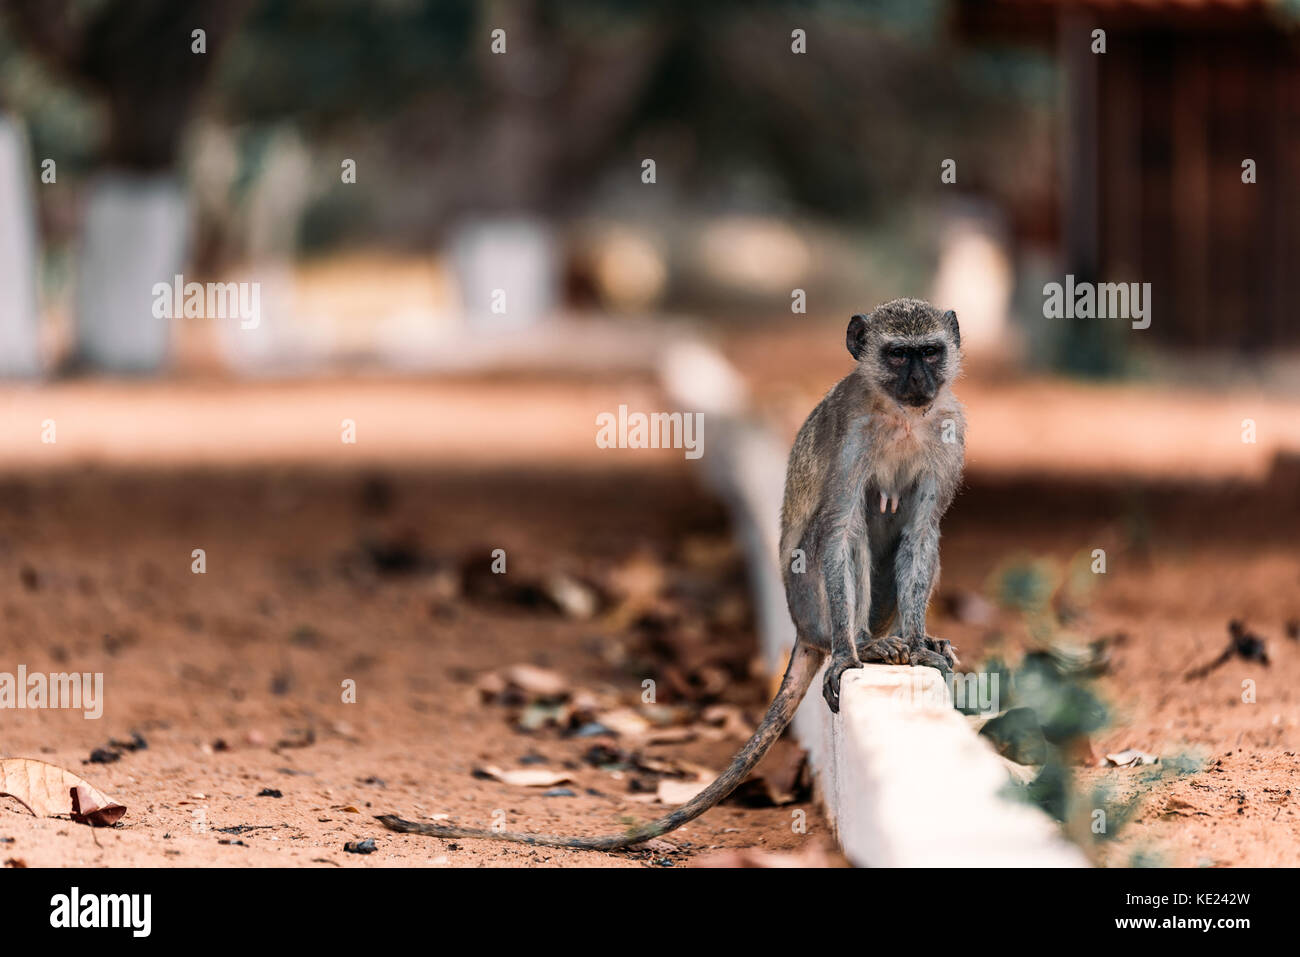 Vervet Monkey in Angola - Stock Image